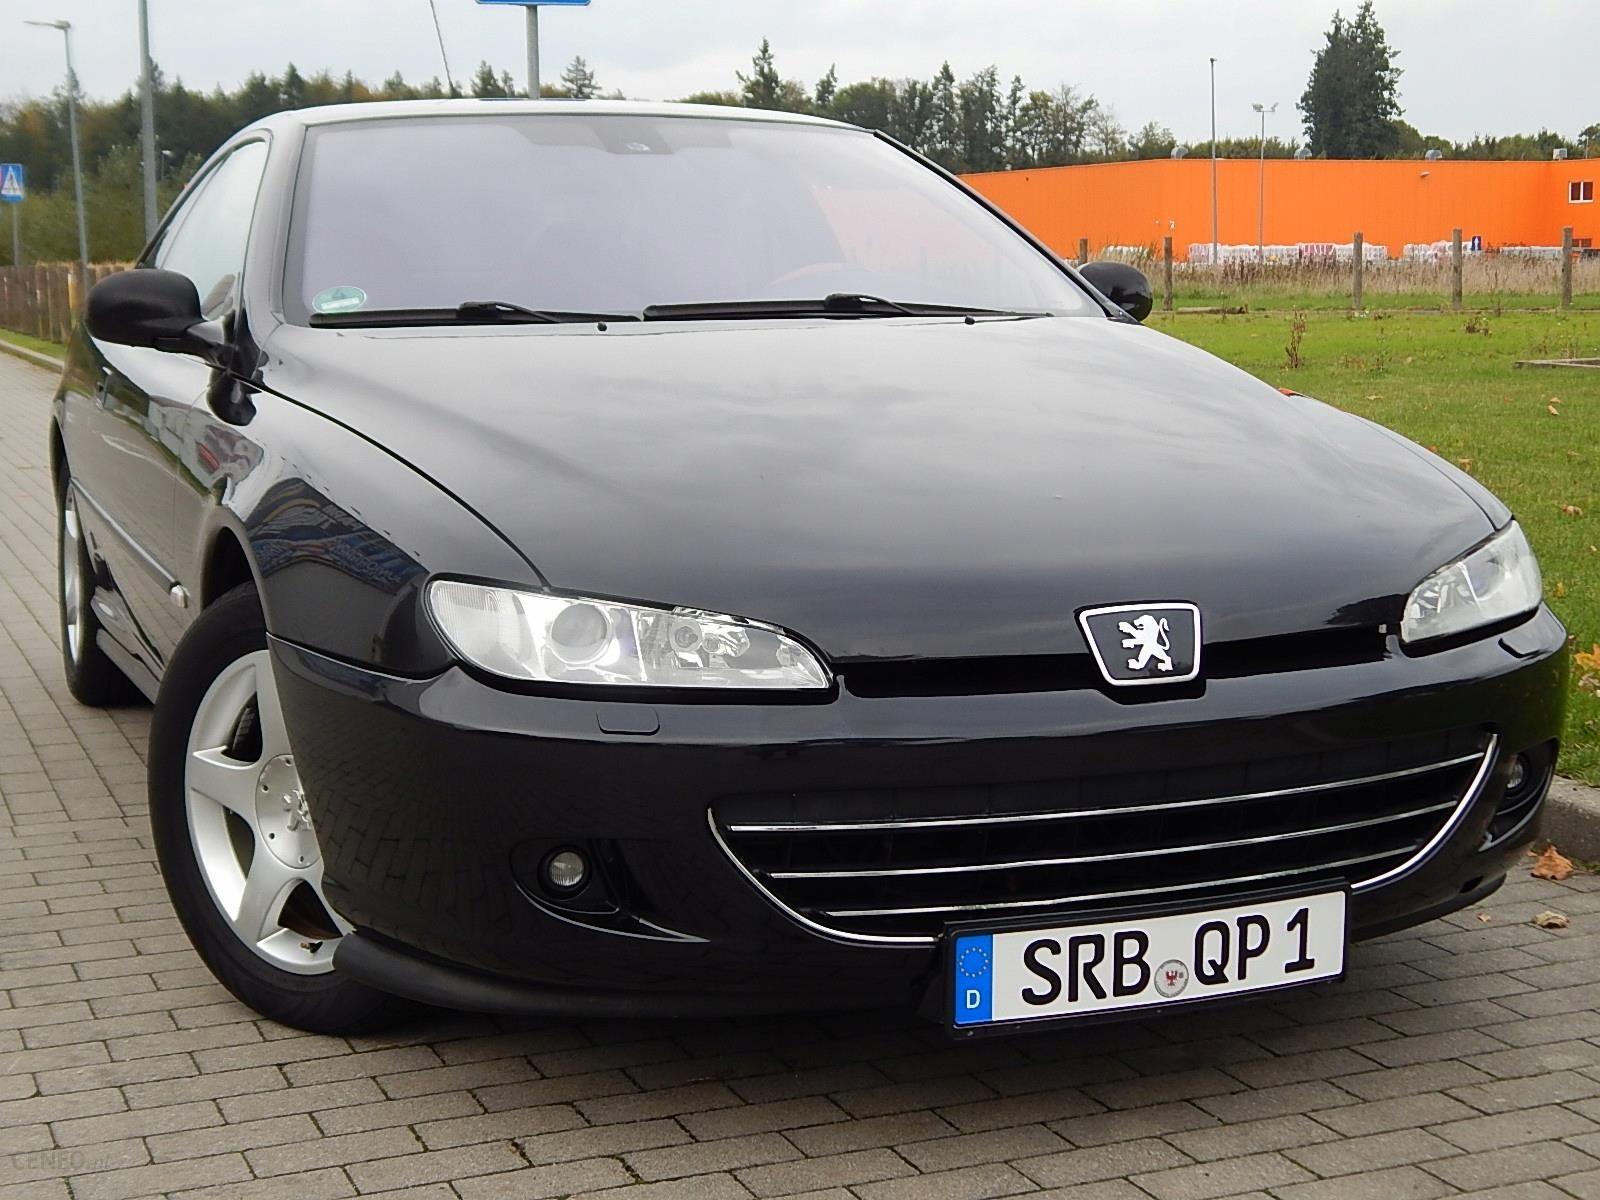 Jedyny Taki Peugeot 406 Coupe 3 0 V6 Aut 207 Km Opinie I Ceny Na Ceneo Pl